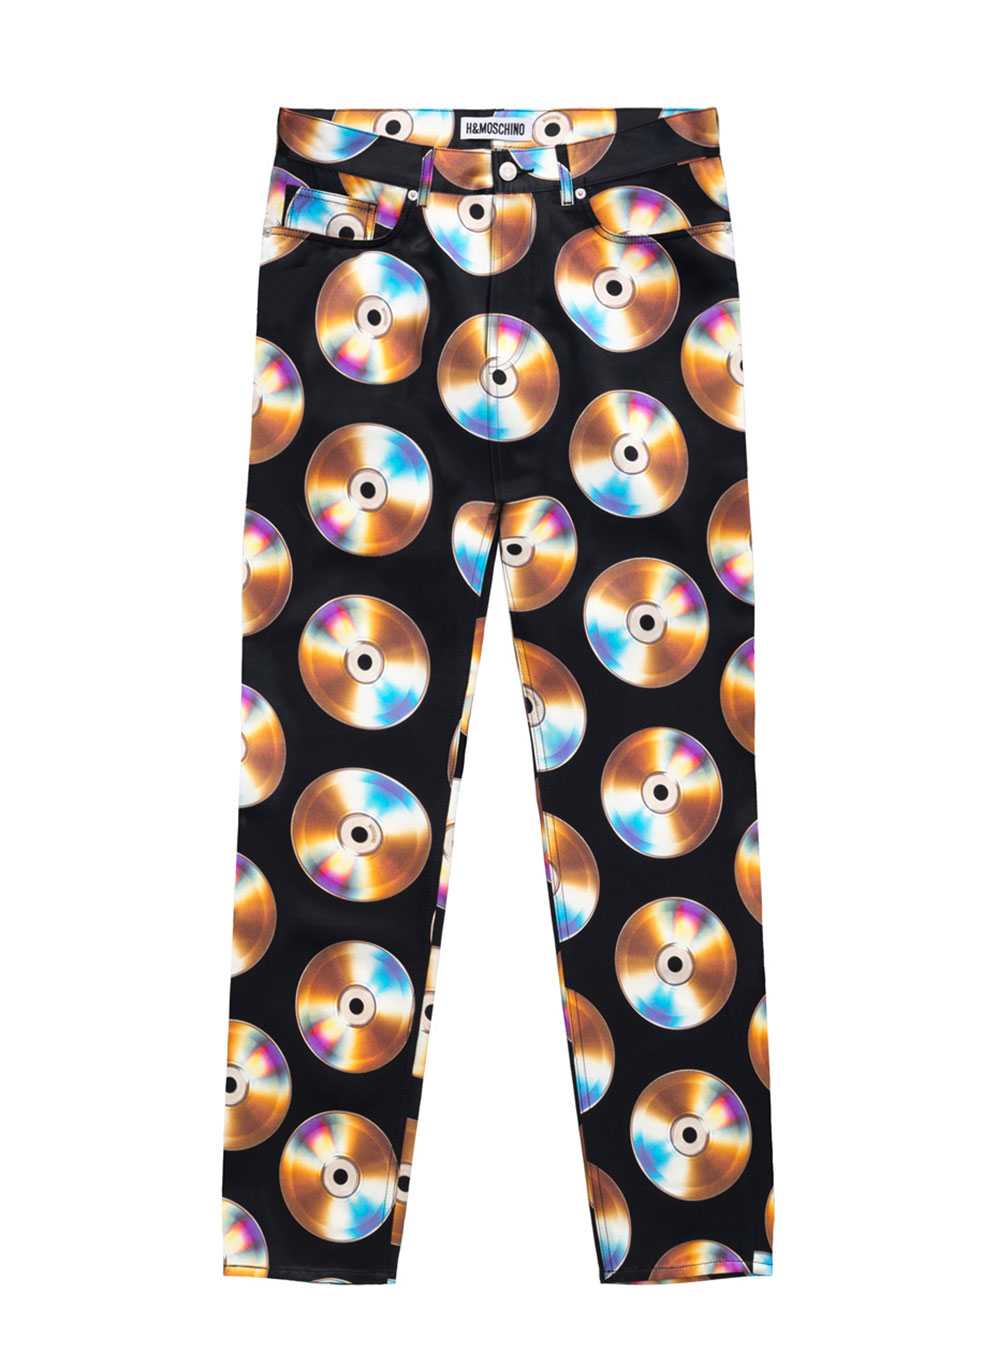 Svarta byxor med cd-skivor som motiv Moschino x H&M